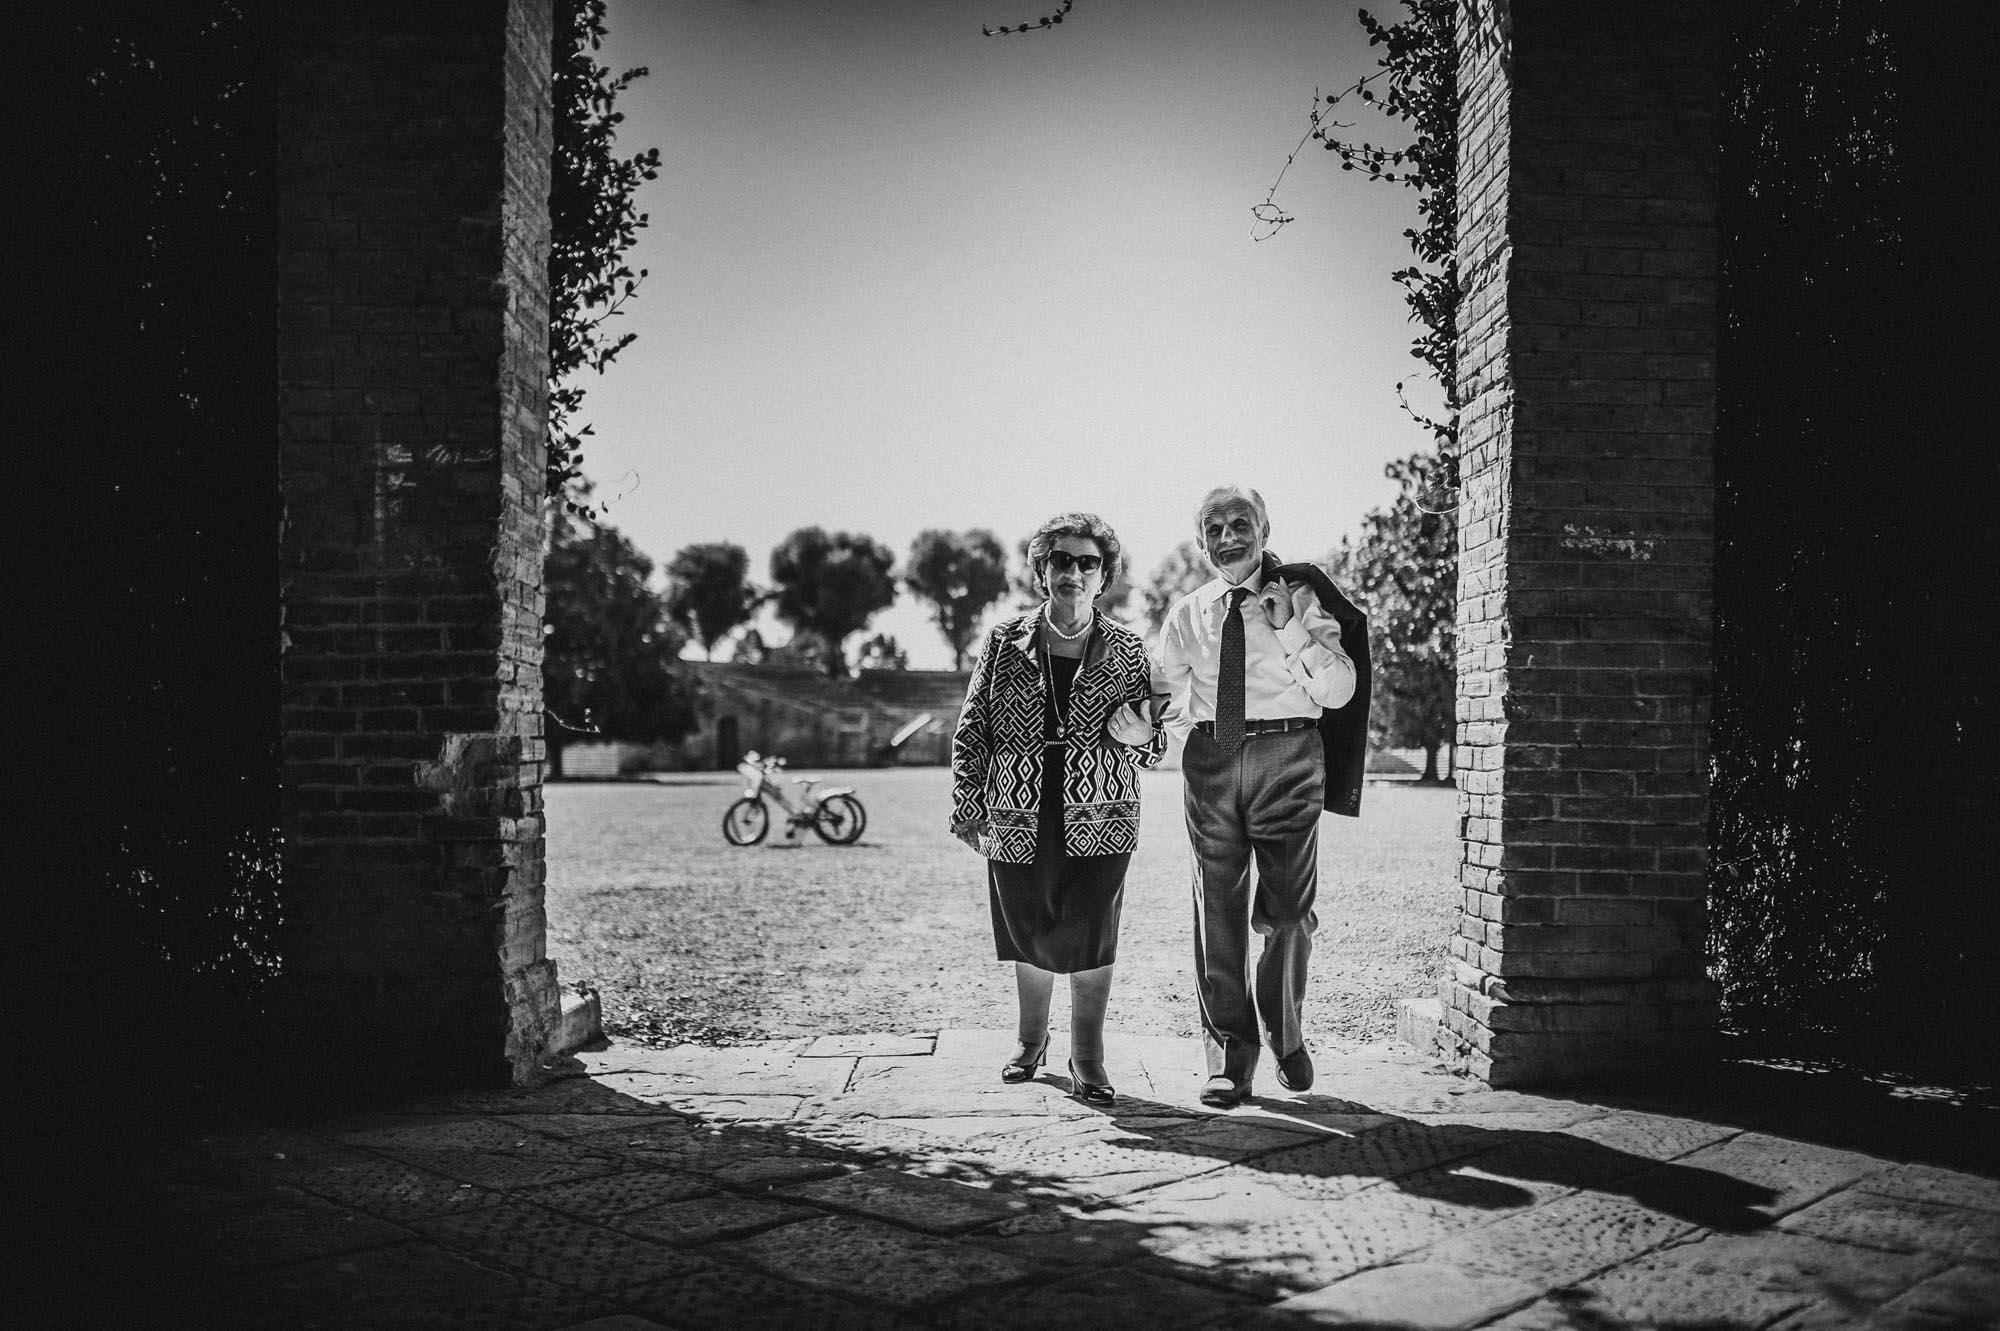 FOTO ANNIVERSARIO DI MATRIMONIO SIENA